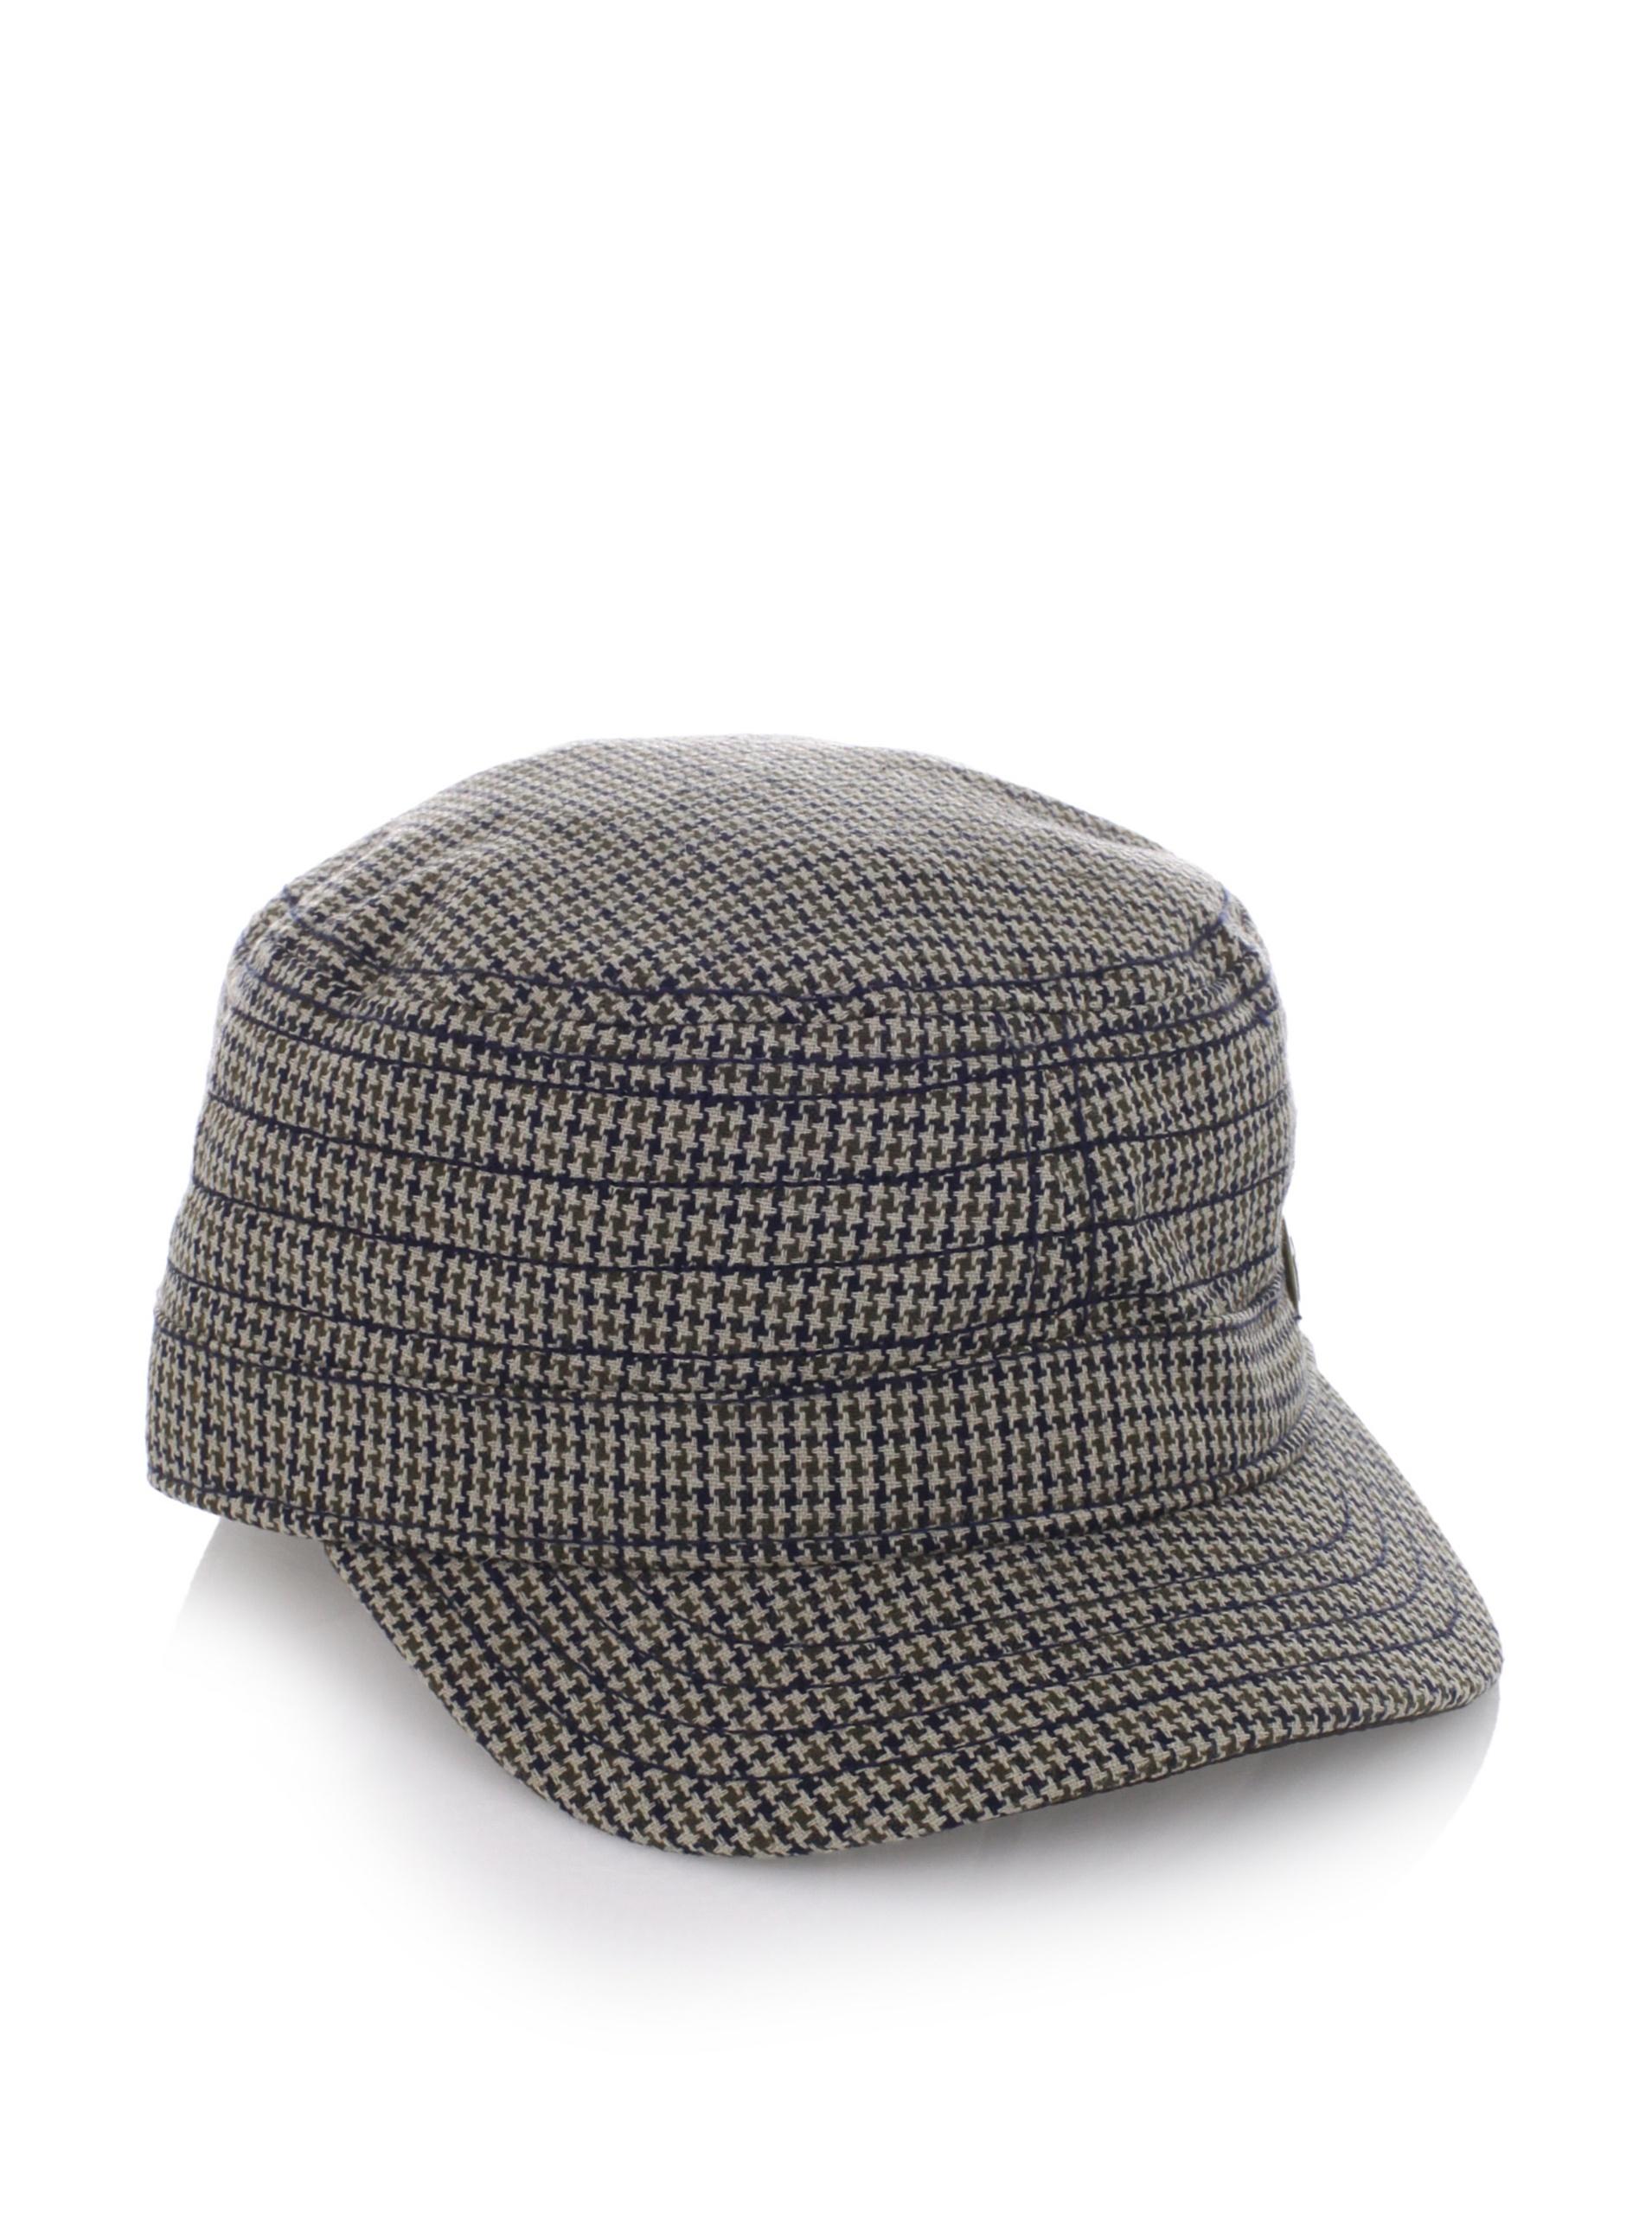 Goorin Brothers Men's Claude Cadet Hat (Tan)